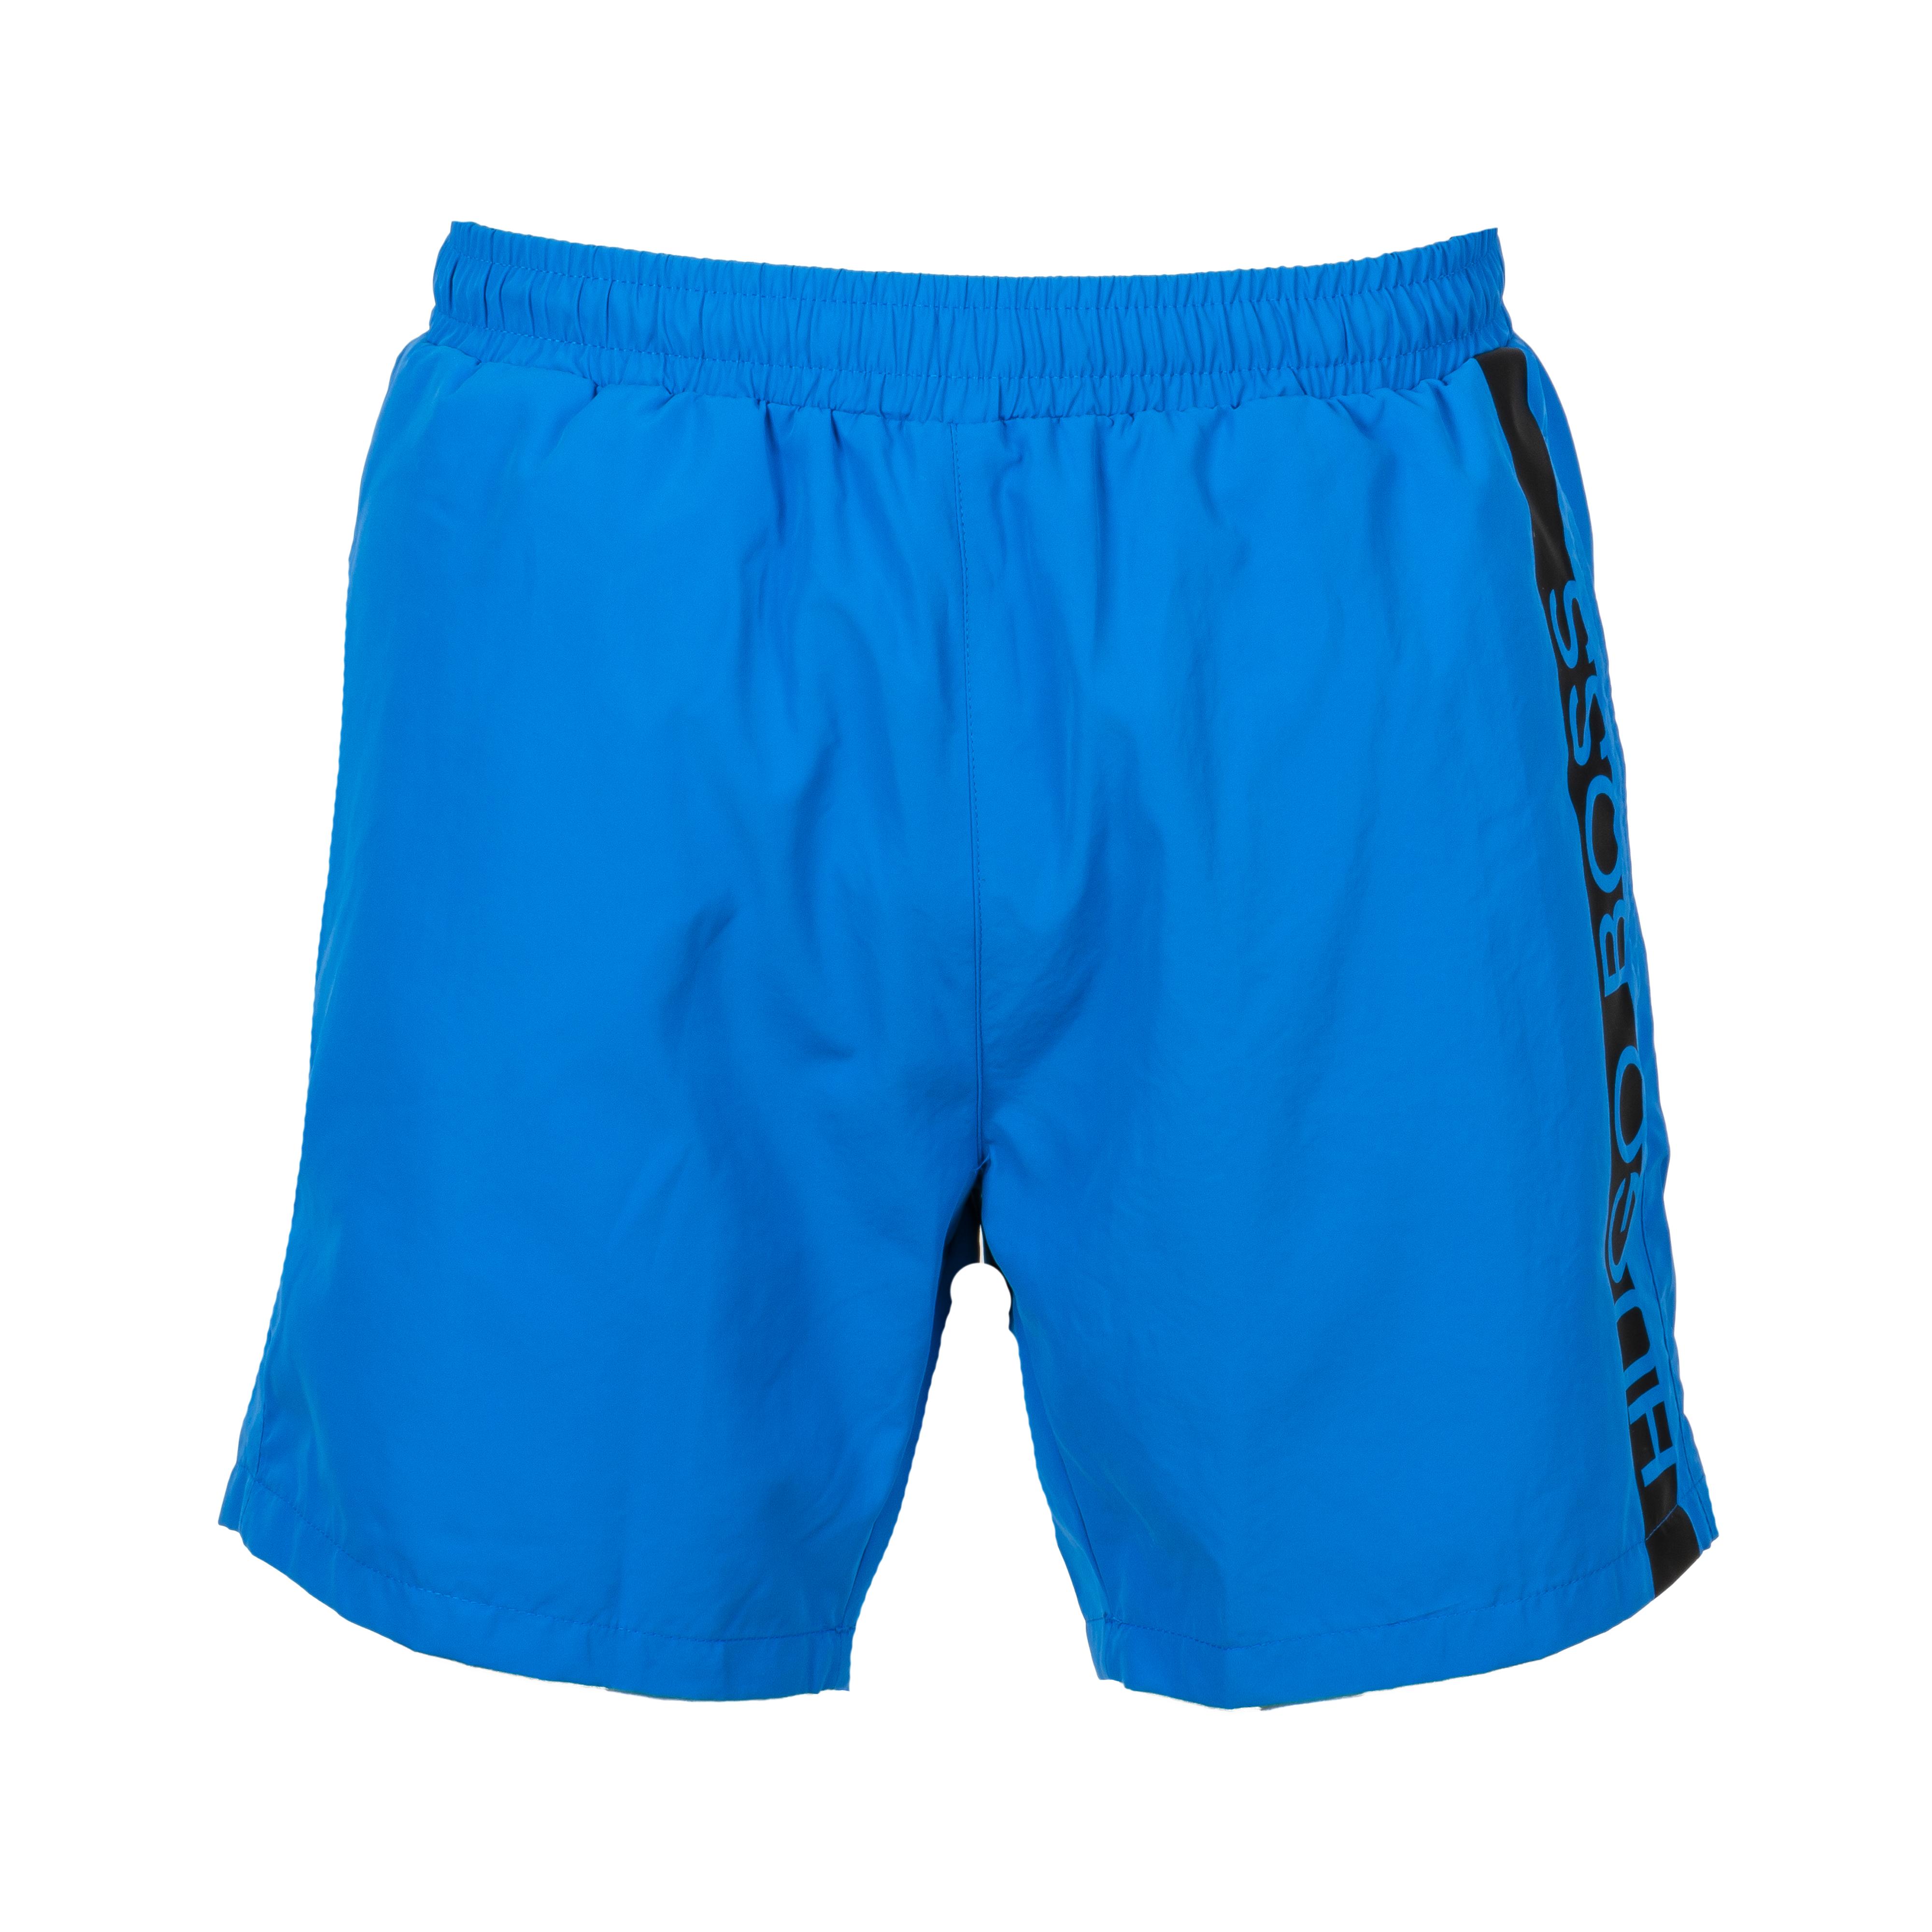 Short de bain  bleu cobalt à bande noire logotypée